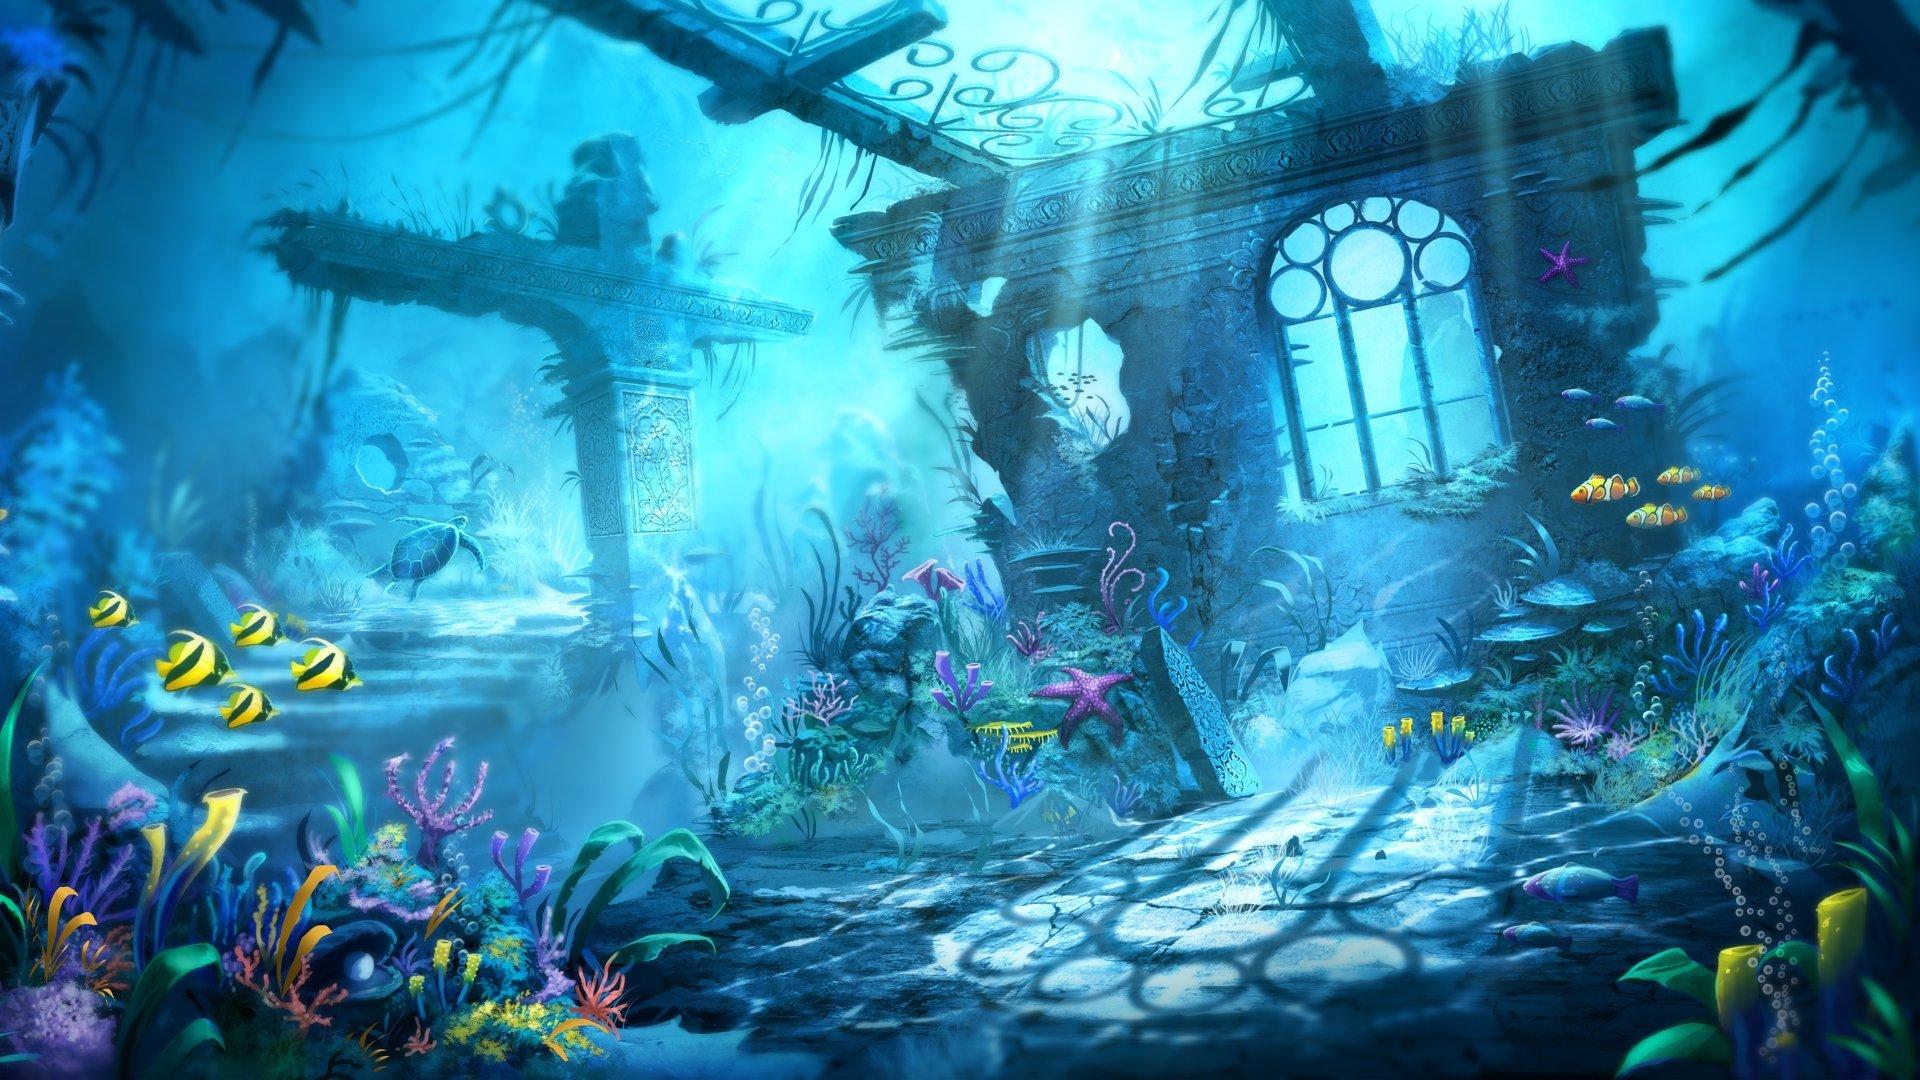 Video Game - Trine 2  Trine Artistic Underwater Fish Plant Building Sea Life Wallpaper